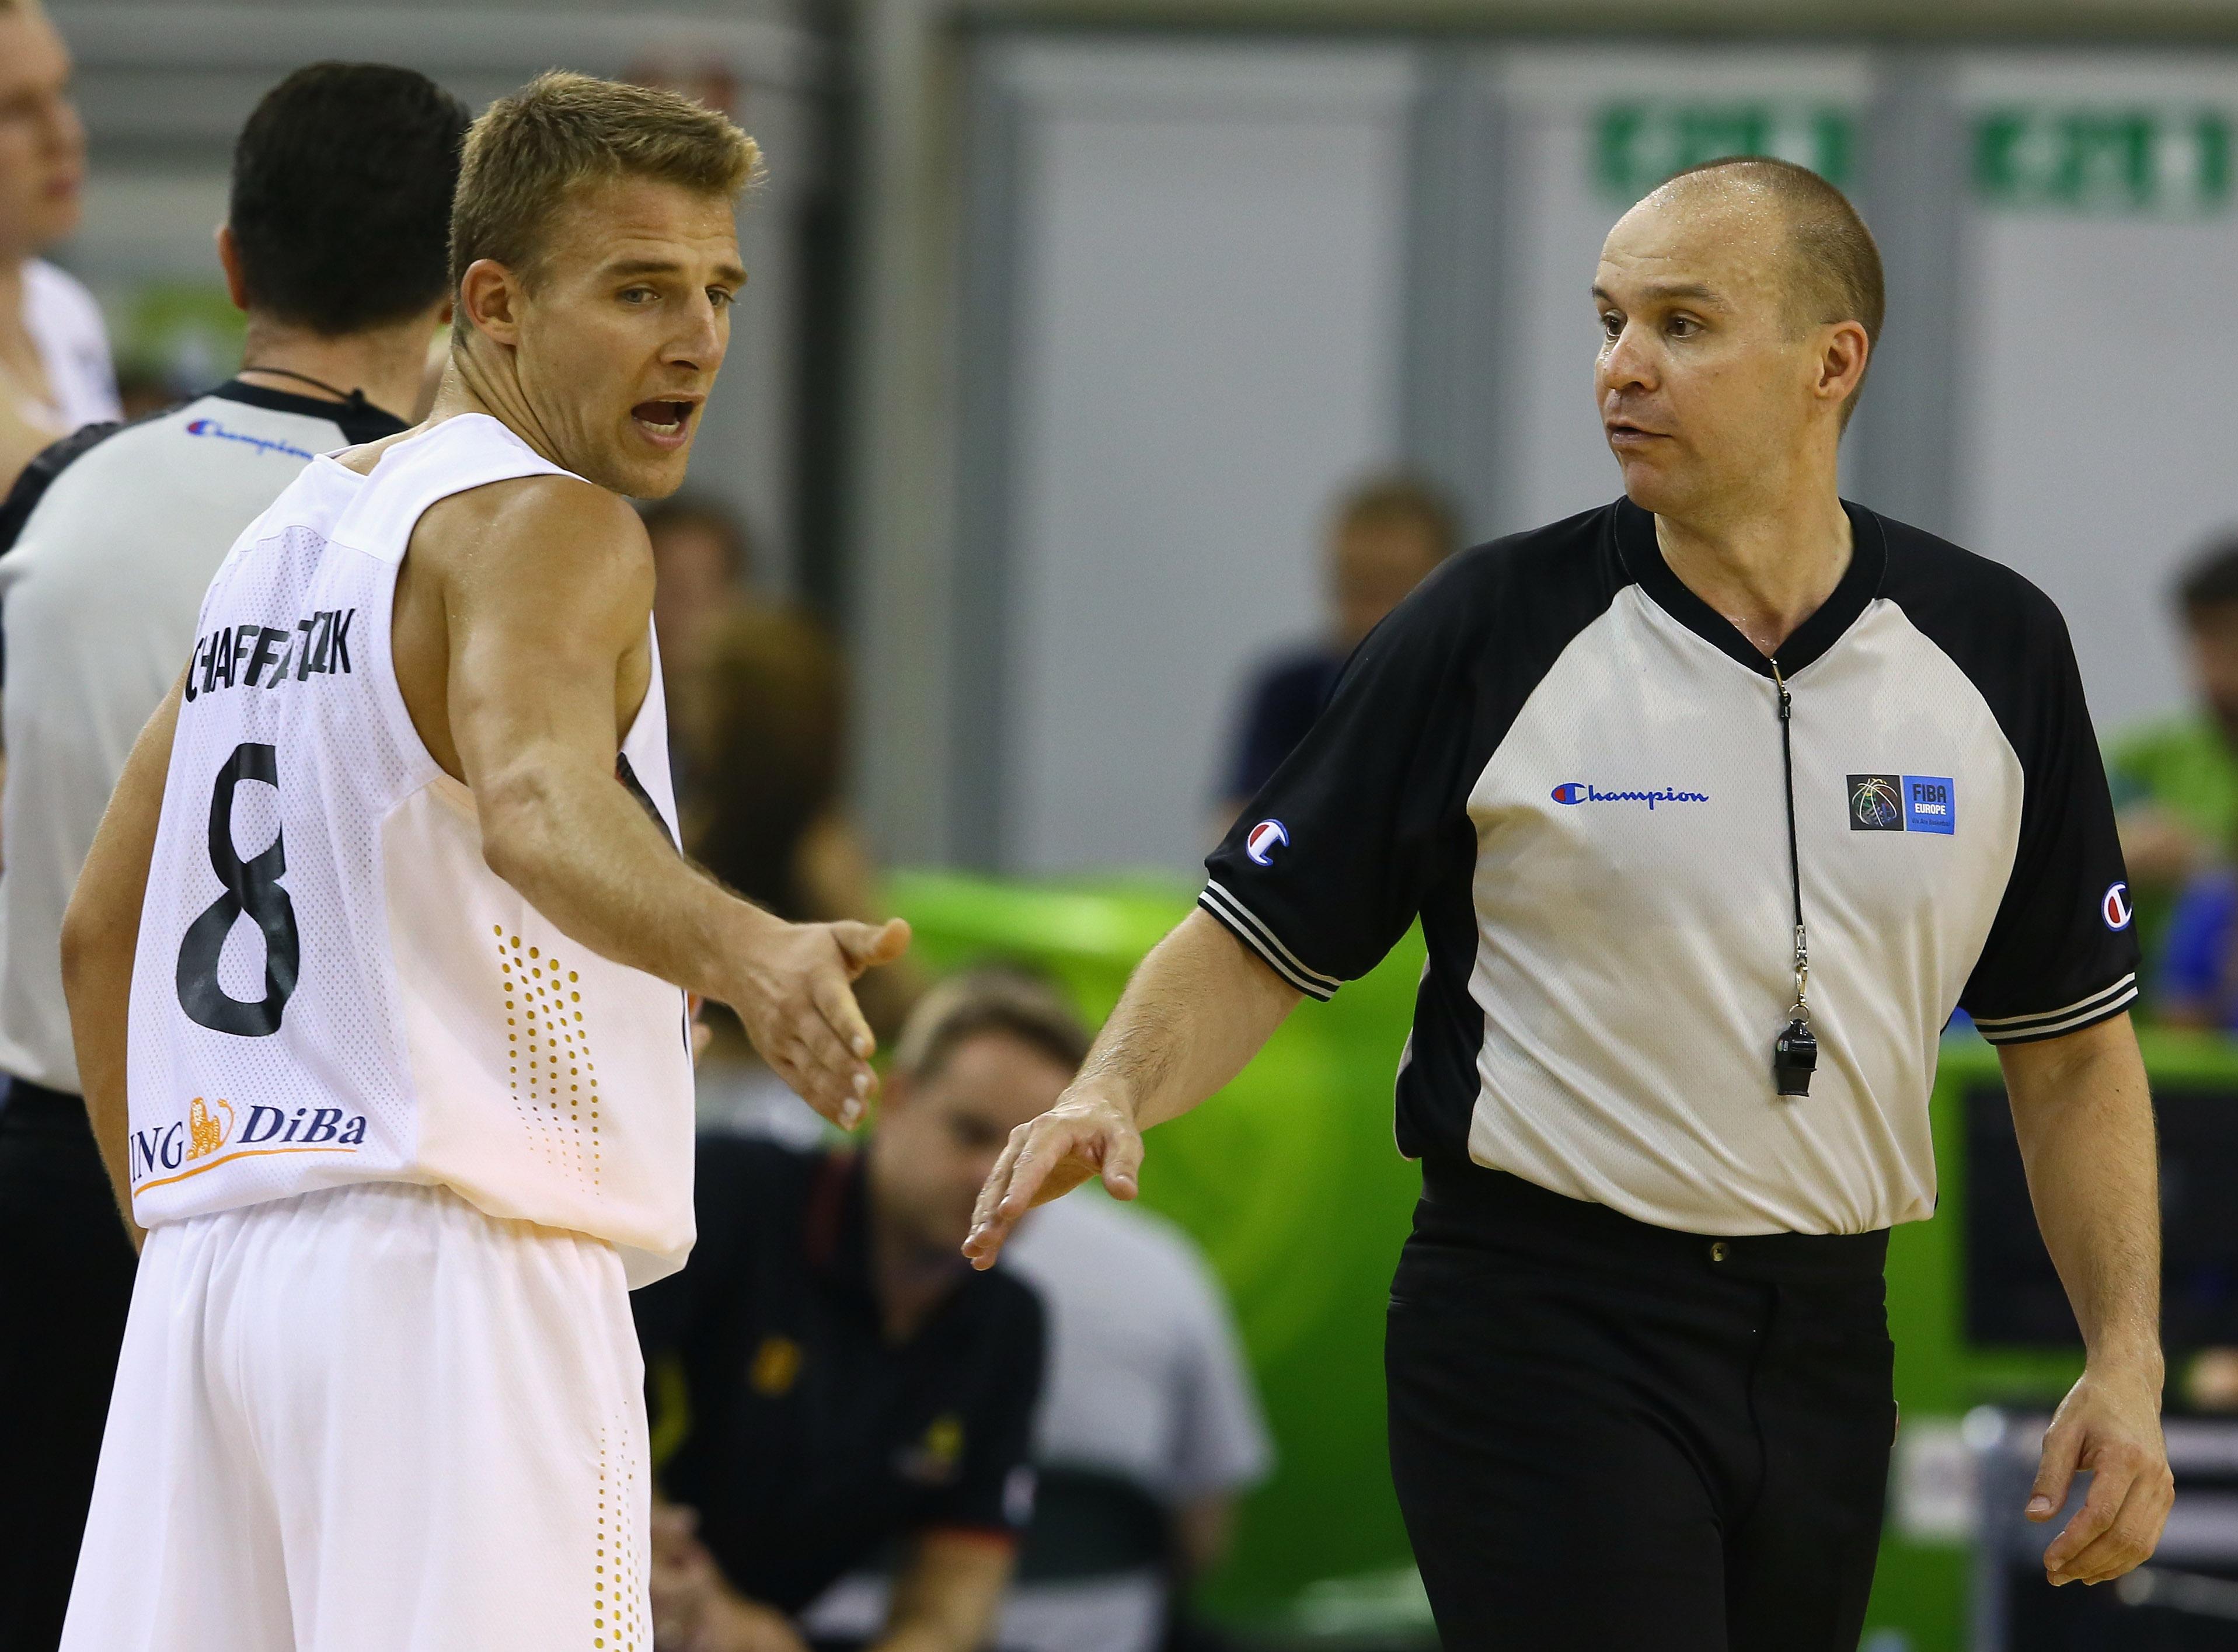 Germany v Ukraine - FIBA European Championships 2013